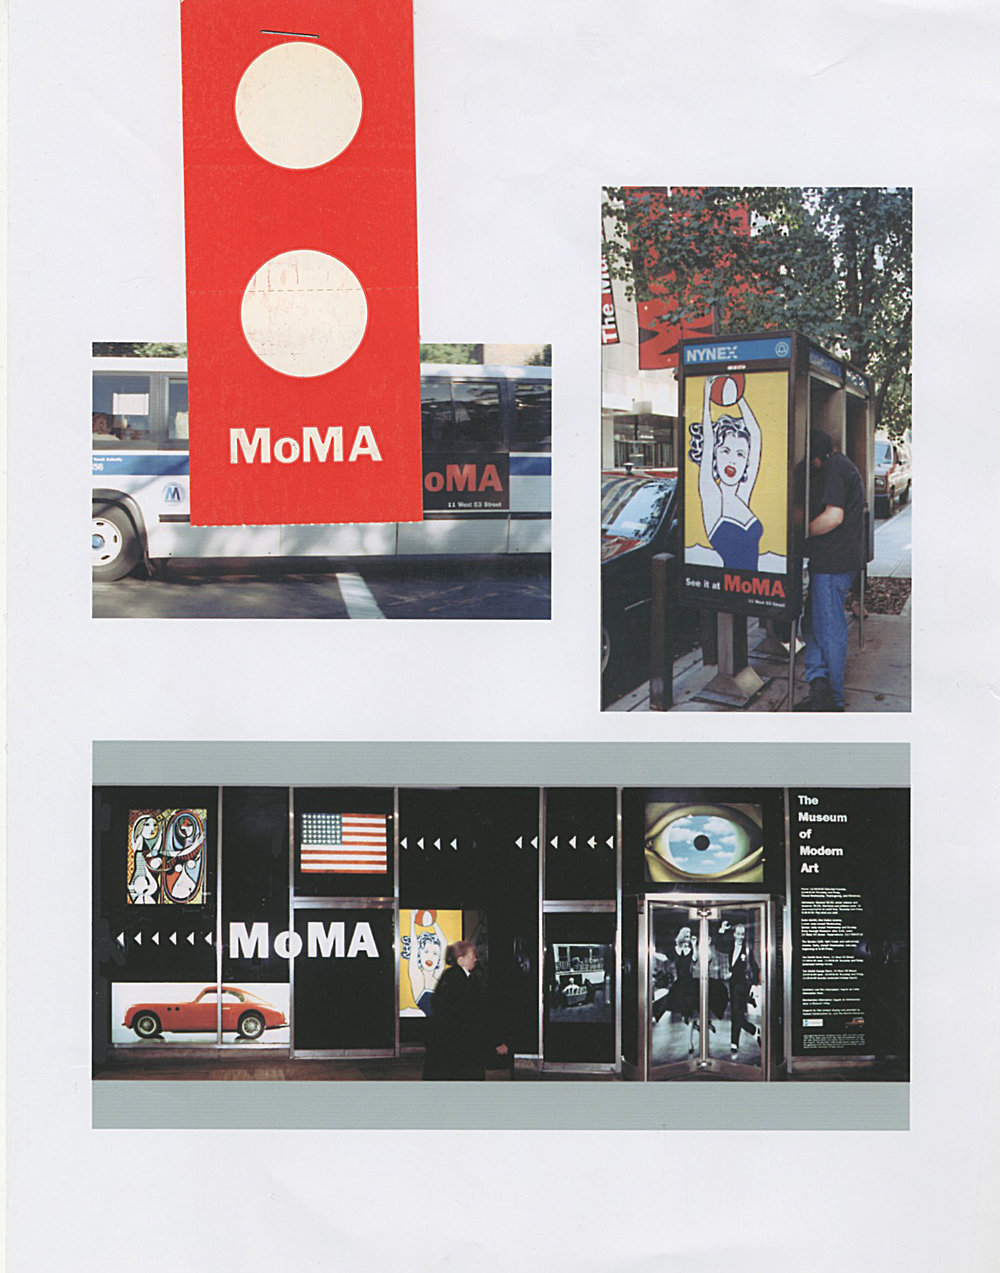 ew_16_MoMA_ephemera.2.jpeg